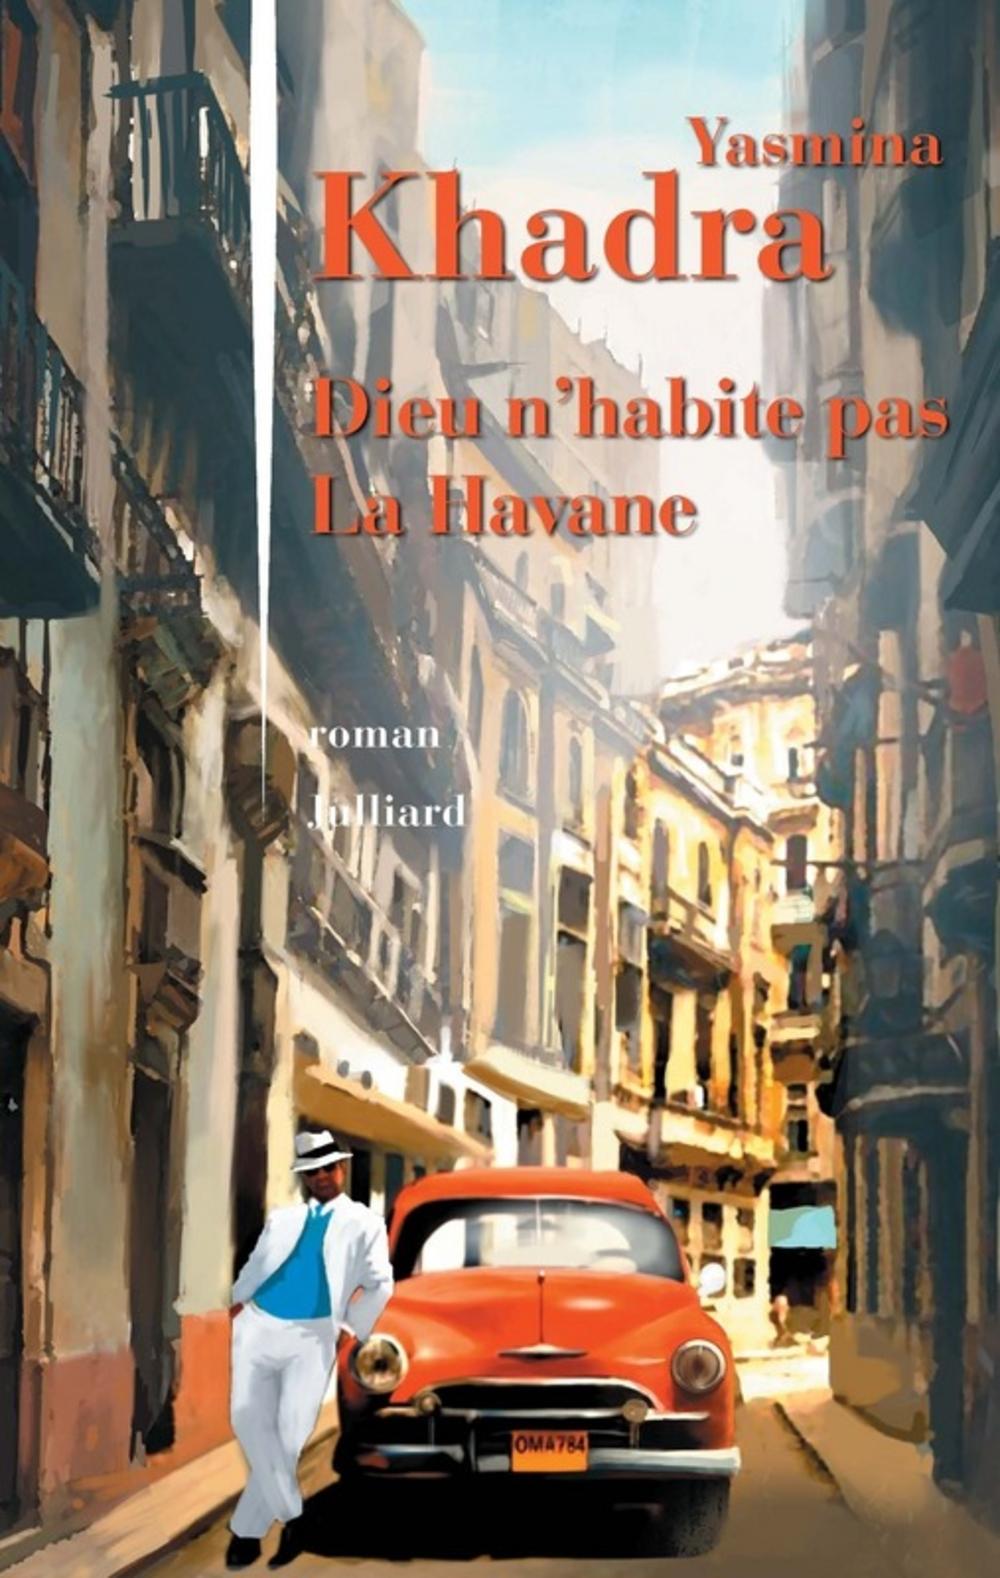 Dieu n'habite pas La Havane | KHADRA, Yasmina